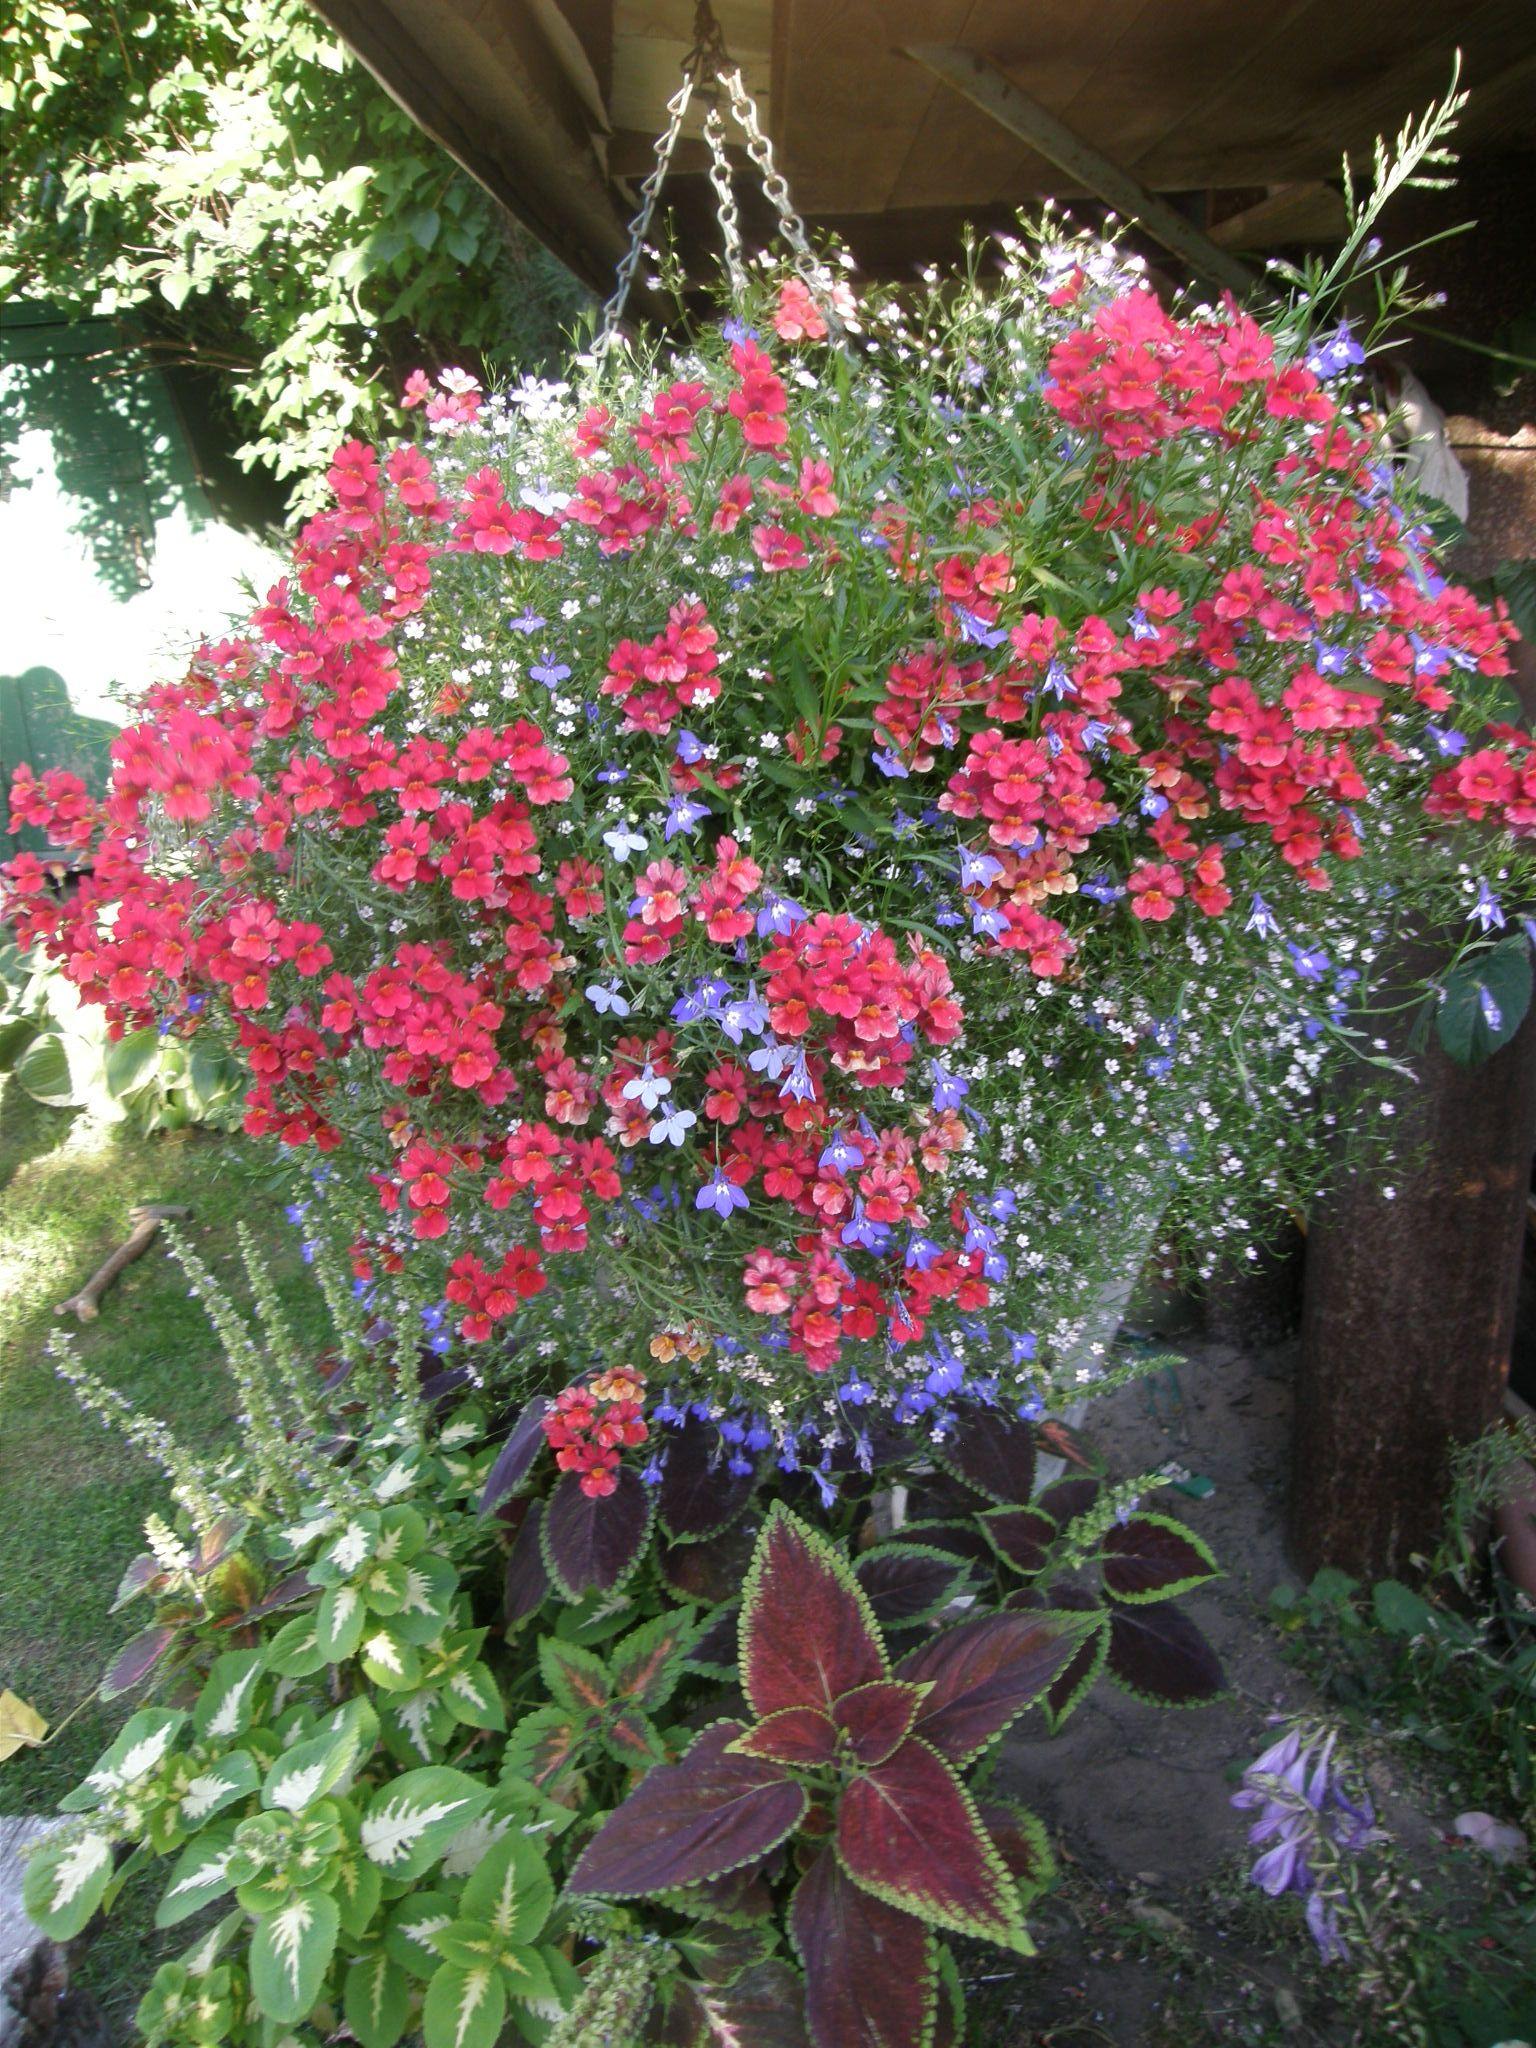 Hanging Basket With Lobelia Nemesia And Gypsophila Very Bright